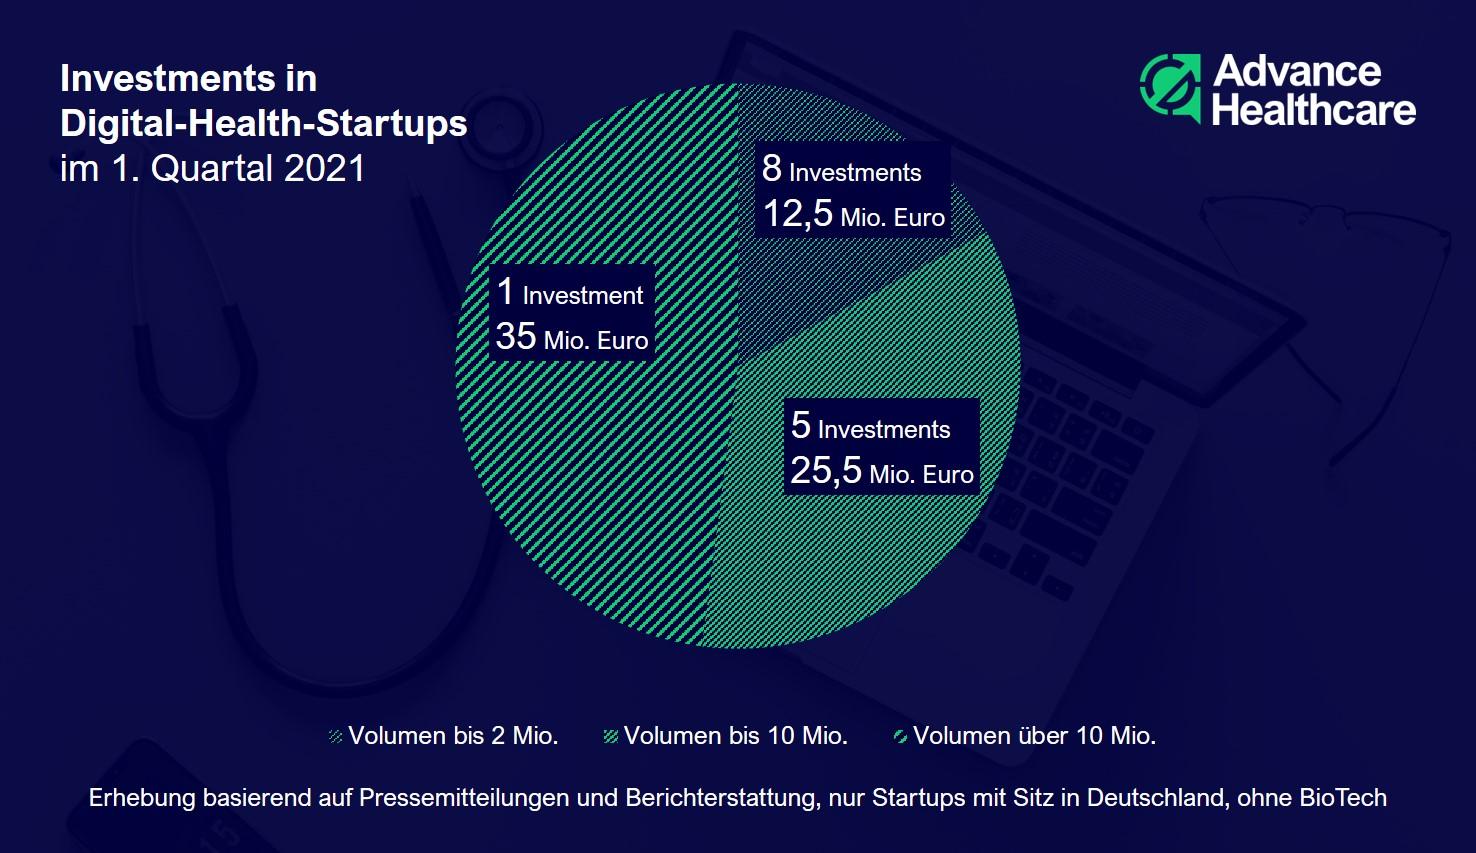 27 Investments in Digital-Health-Startups im 1. Quartal 2021